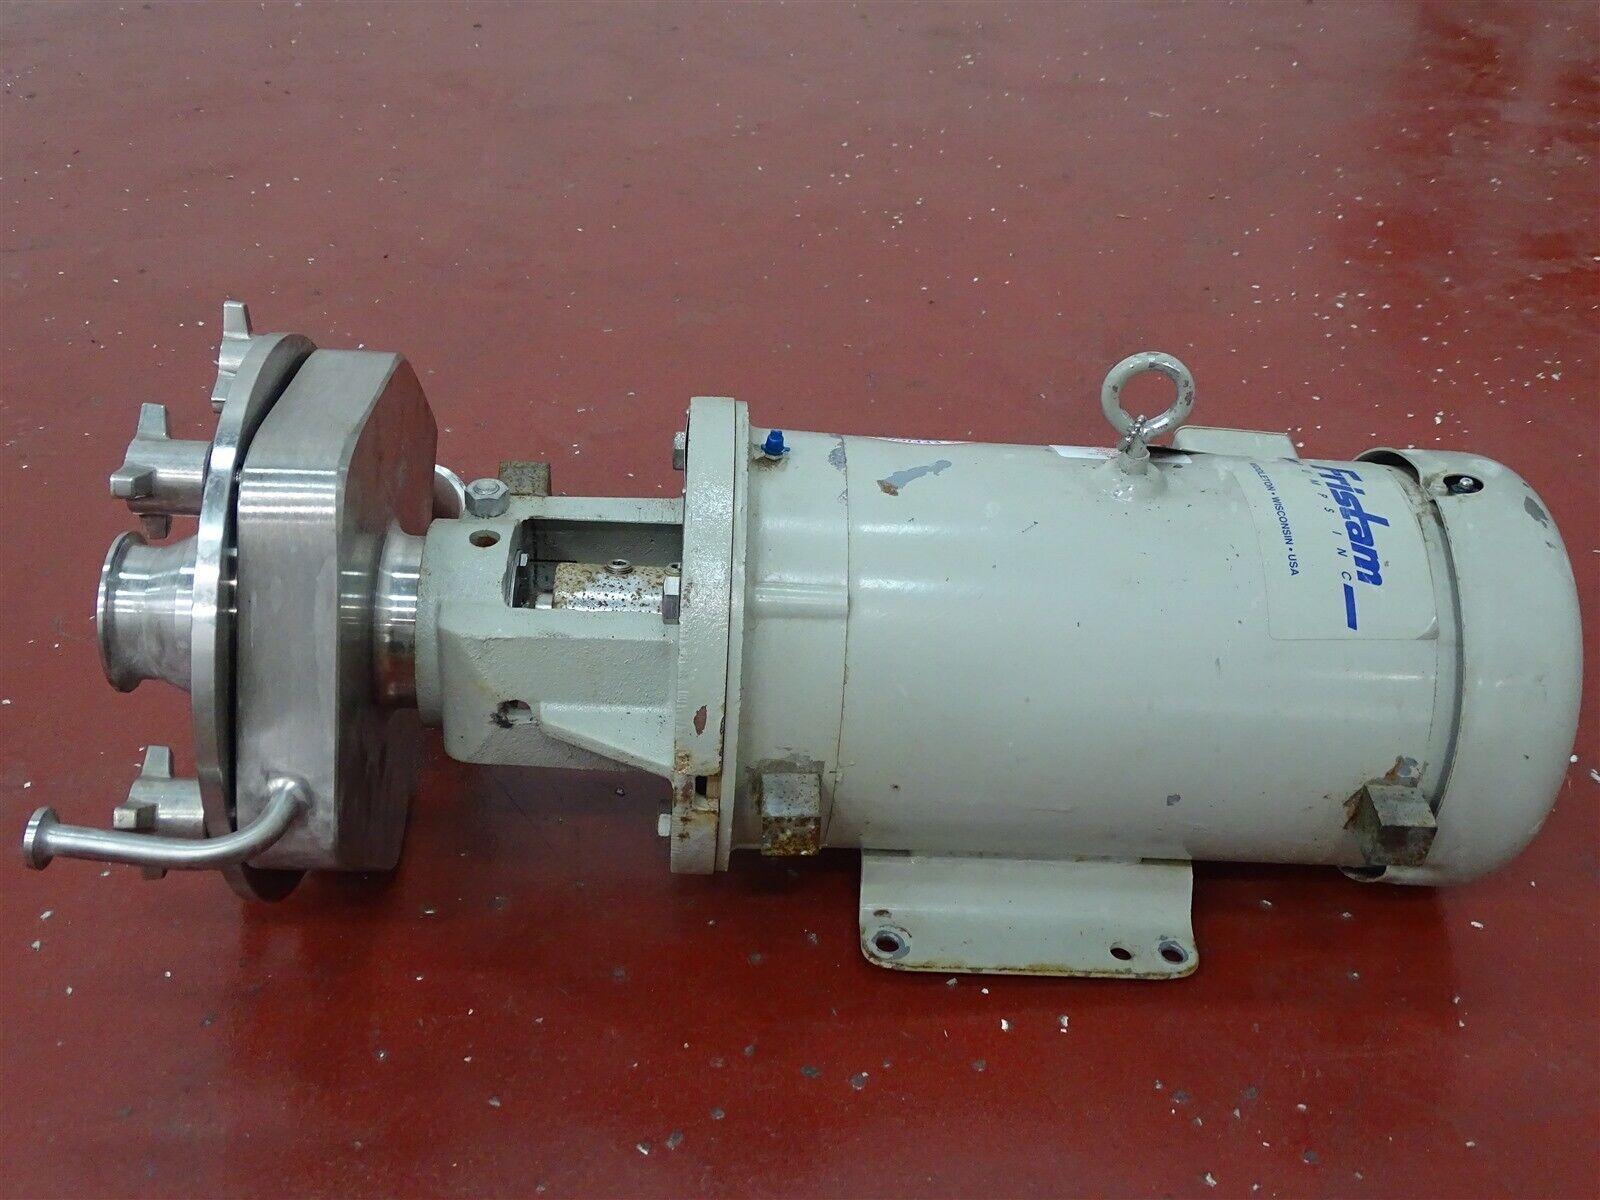 Fristam FPX742-185 Stainless Pump w/ Baldor CM5616T Motor 7-1/2HP 3450RPM 60Hz